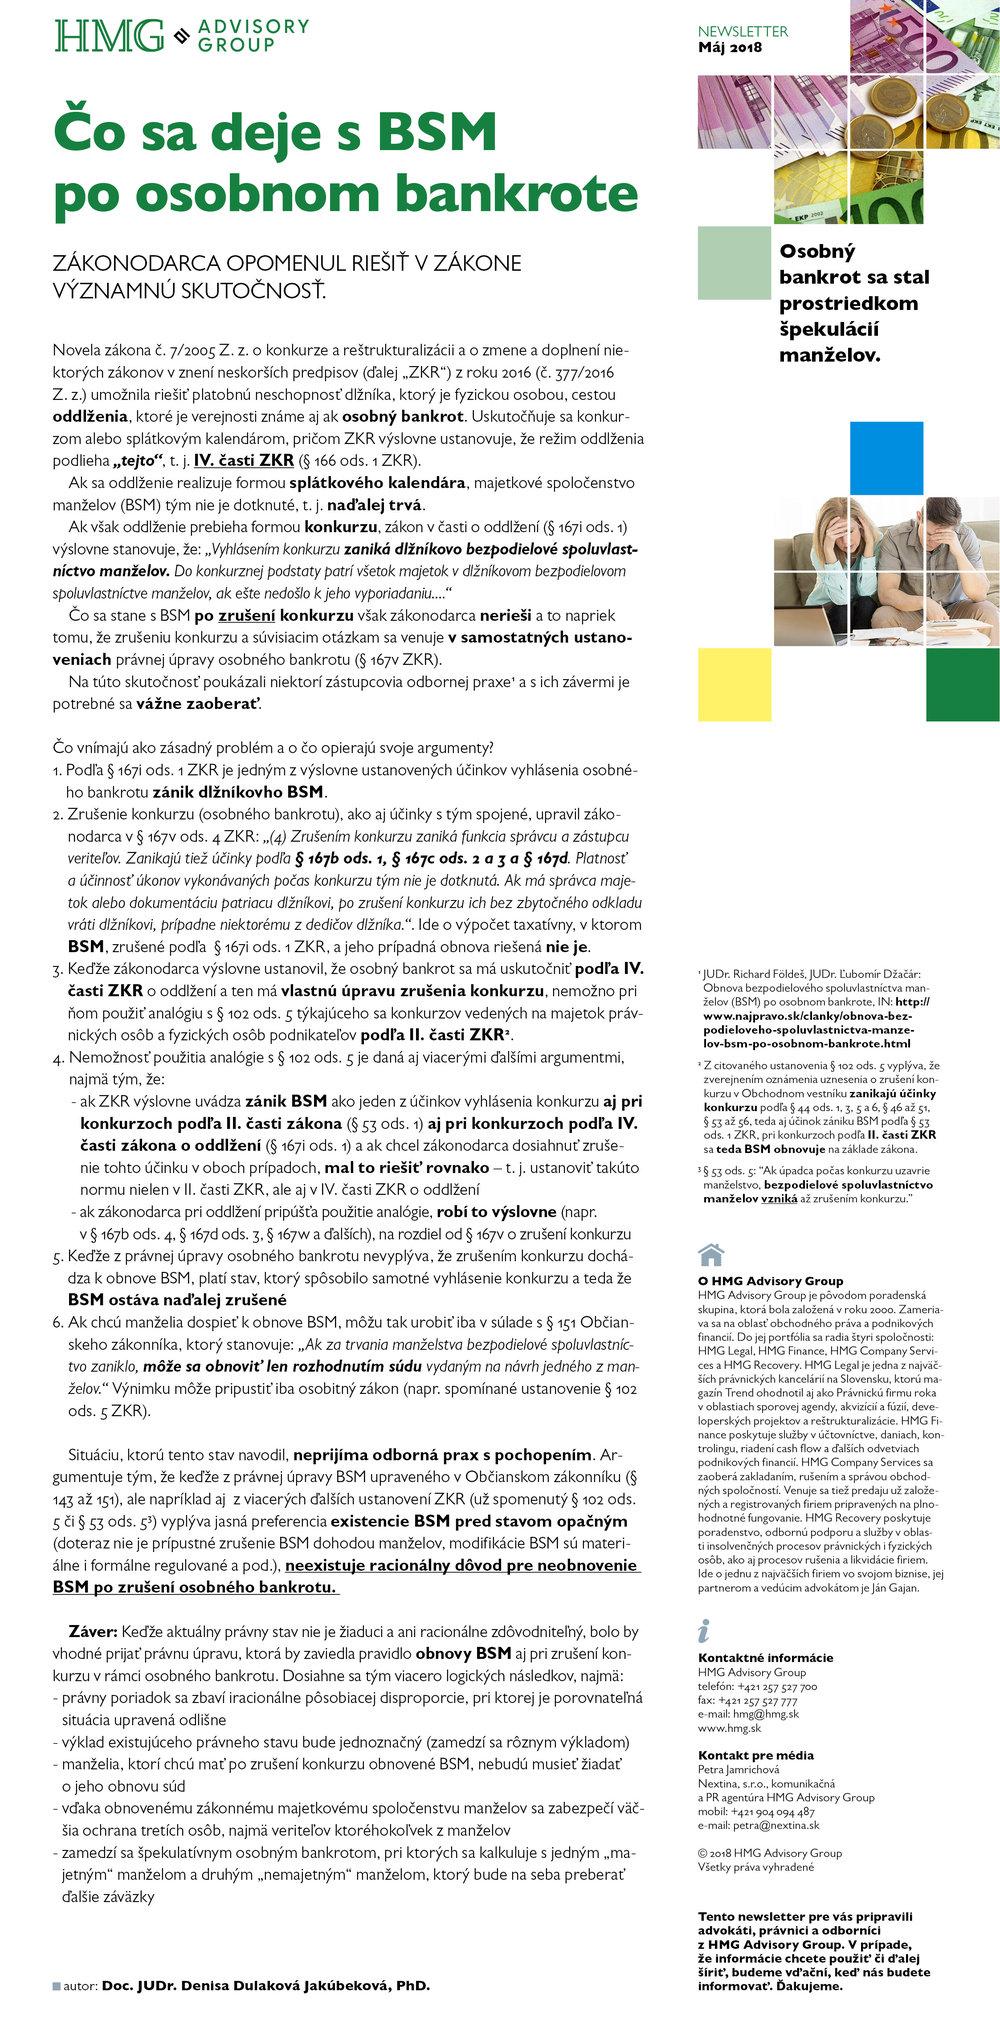 HMG_newsletter_osobny bankrot.jpg